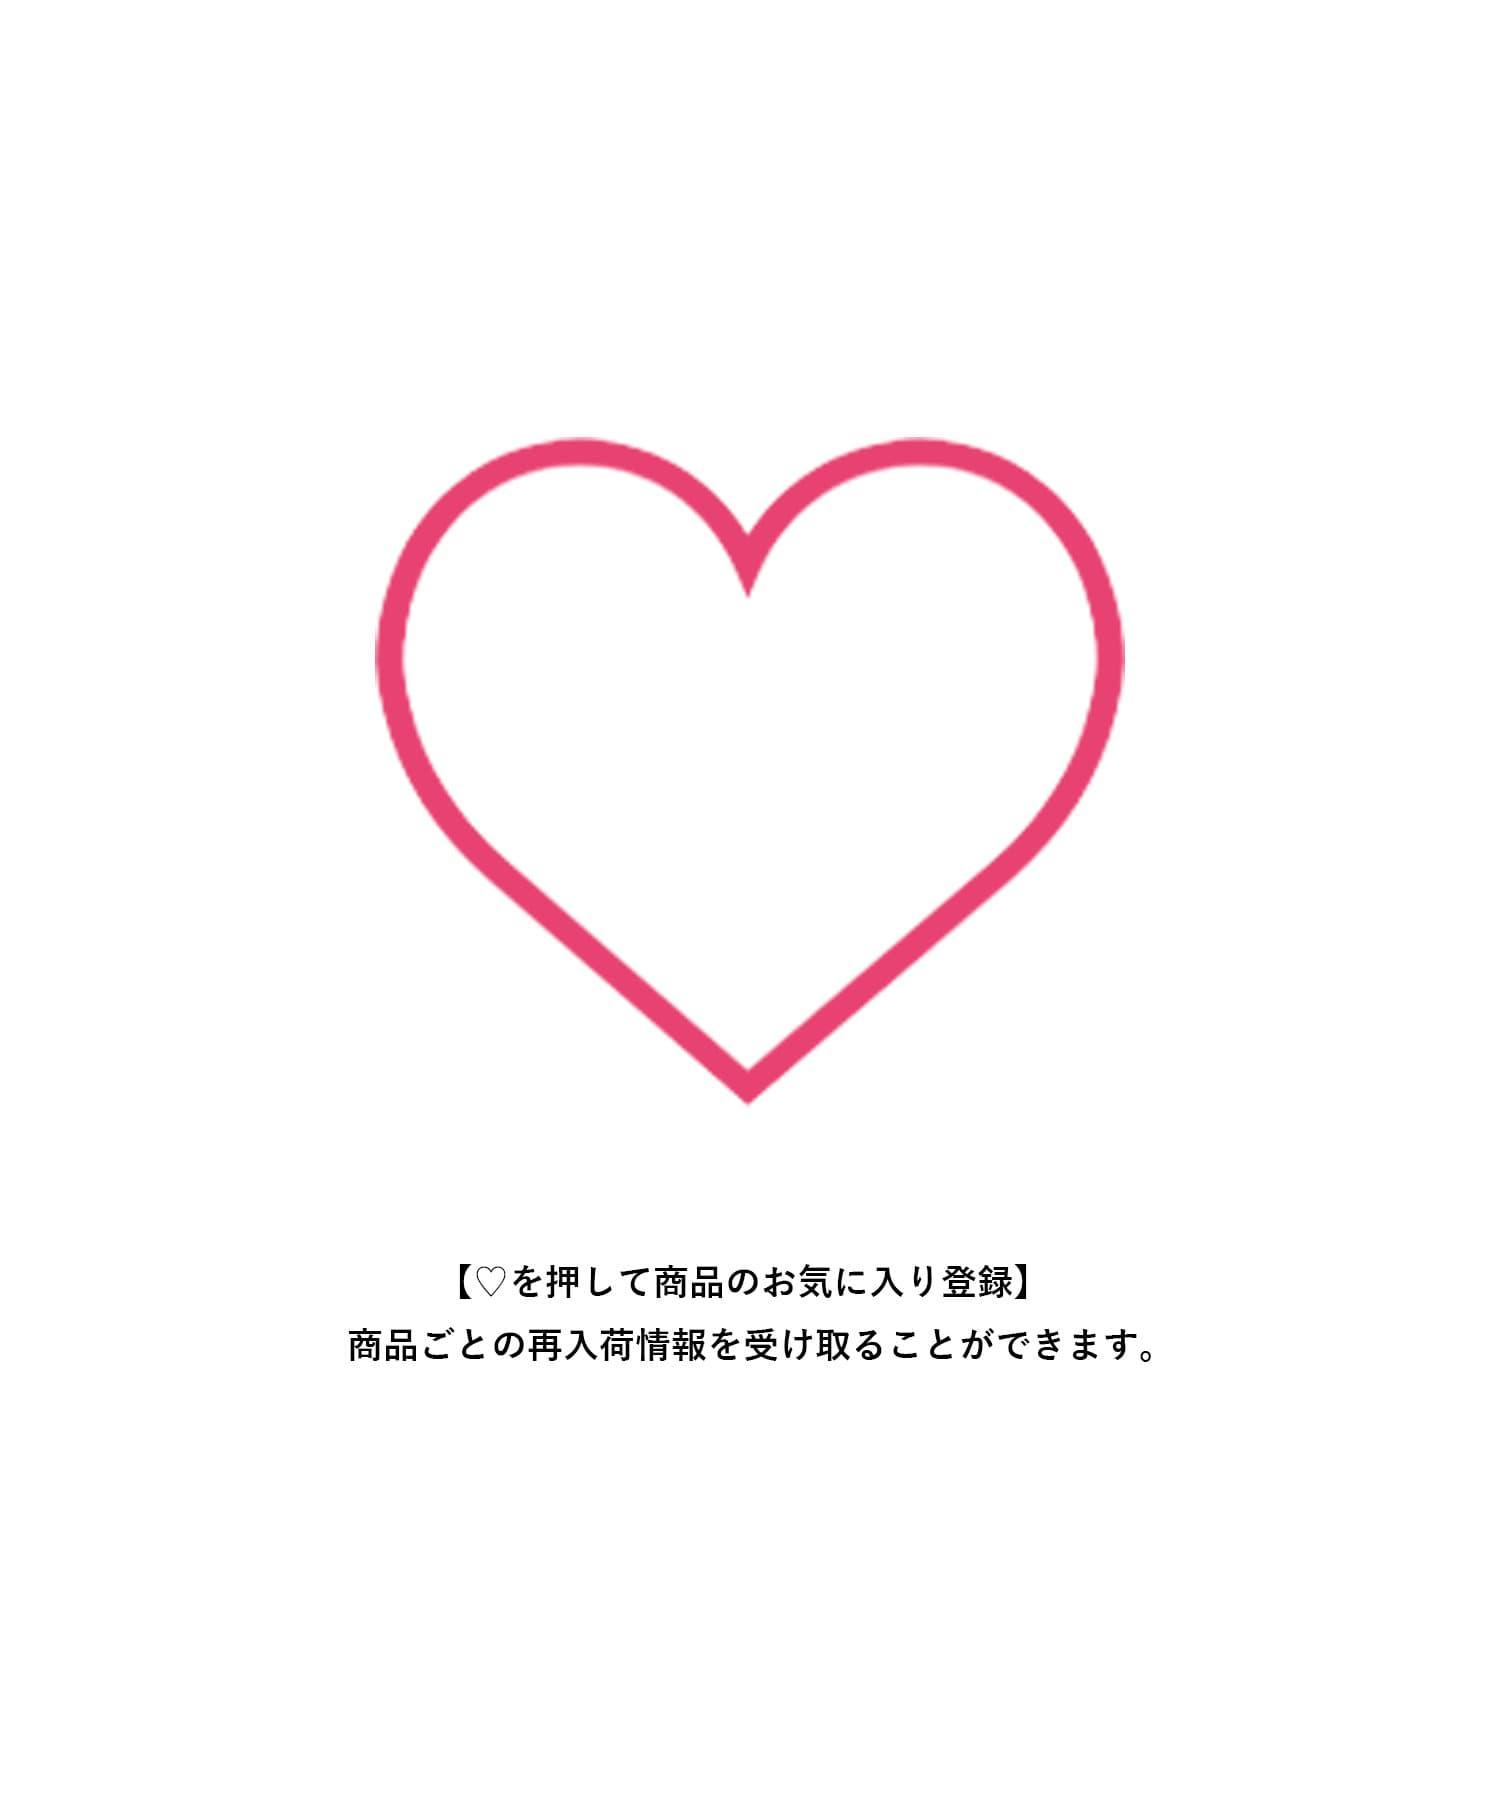 COLLAGE GALLARDAGALANTE(コラージュ ガリャルダガランテ) 【PAPILLONNER/パピヨネ】グリッタースタッドイヤリング